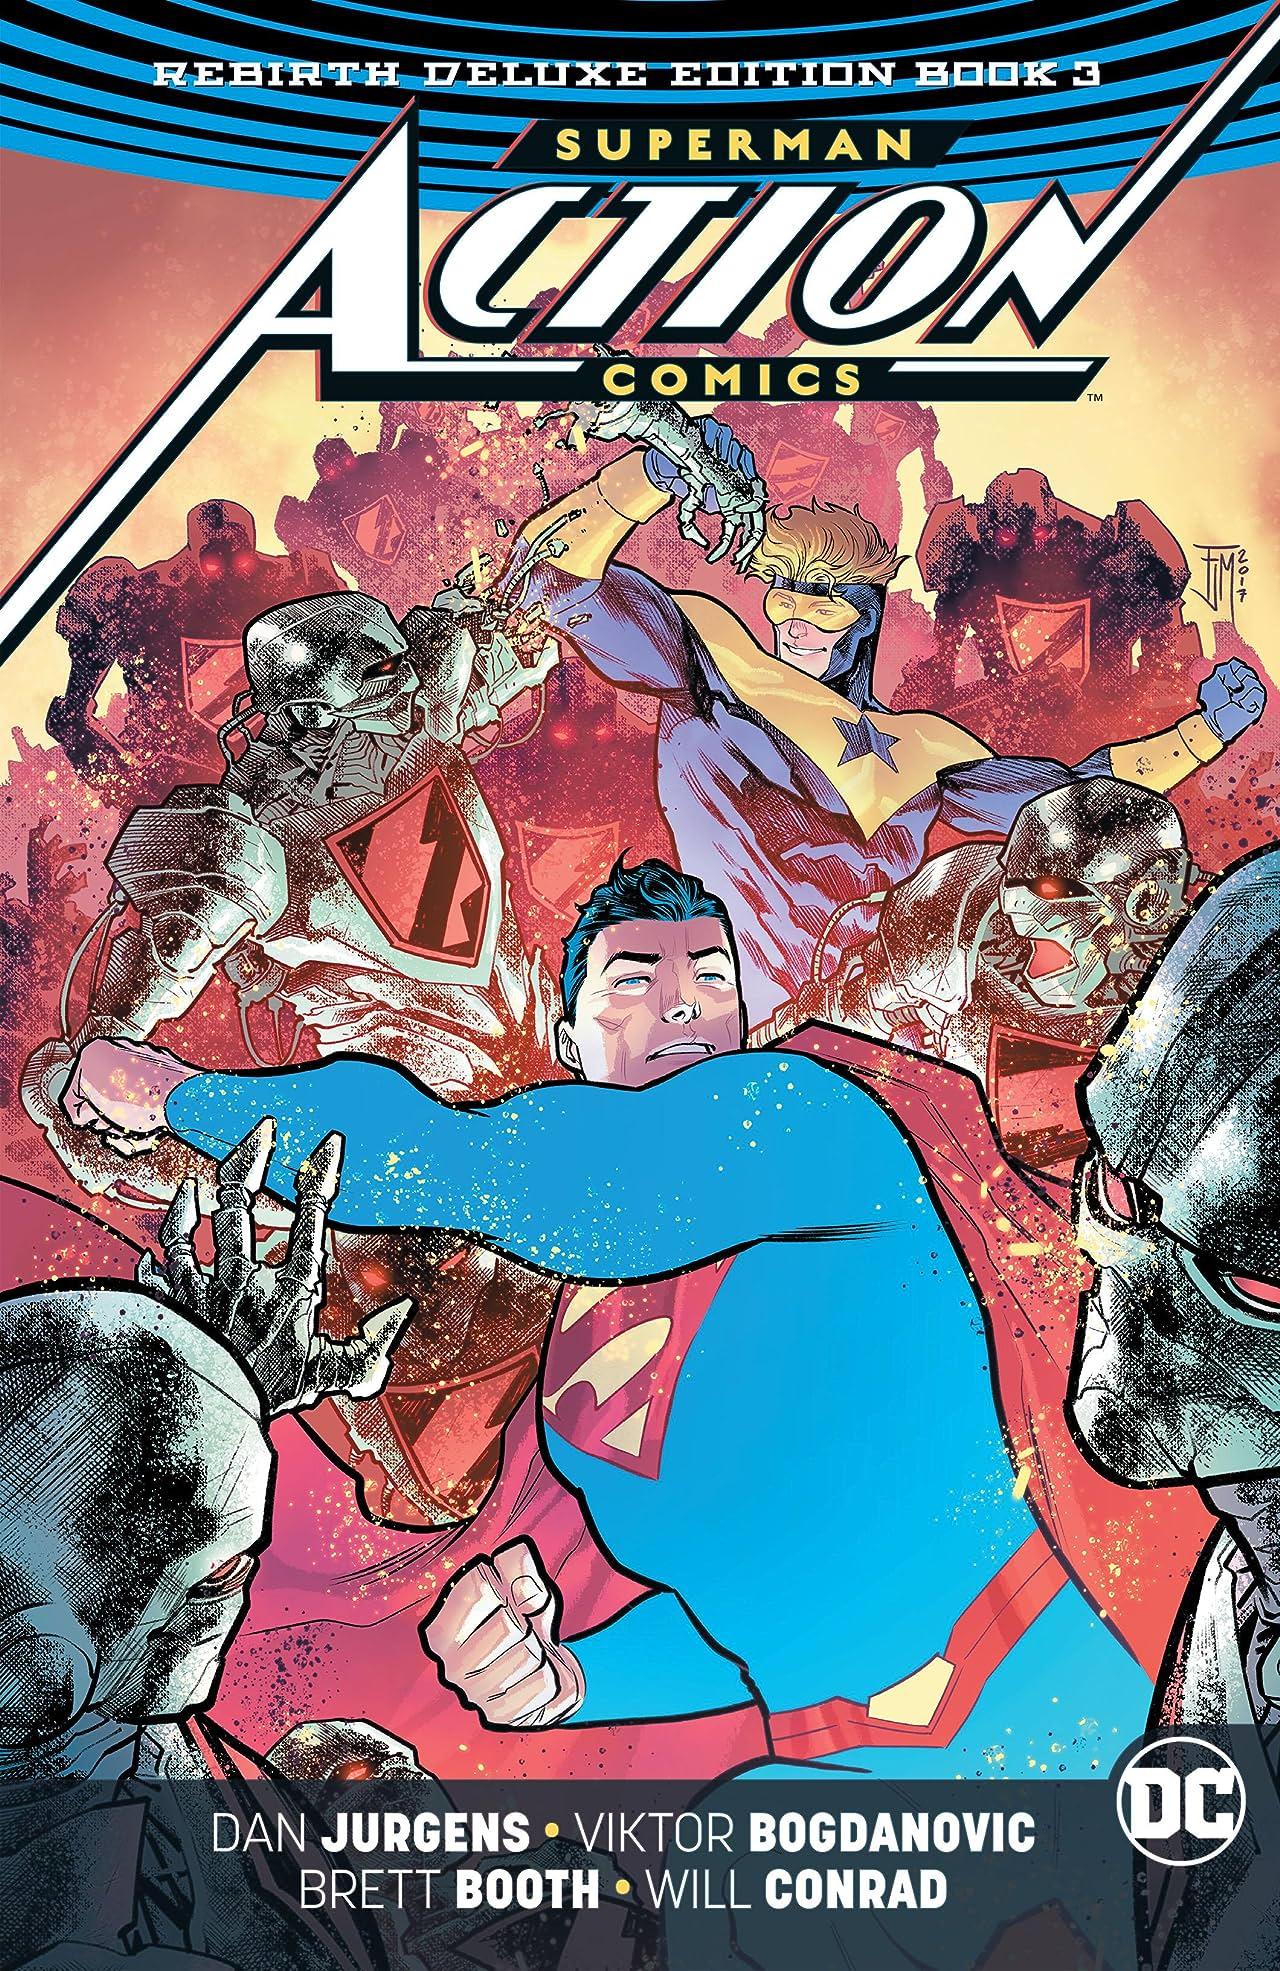 Superman - Action Comics (2016-): The Rebirth - Deluxe Edition: Book 3